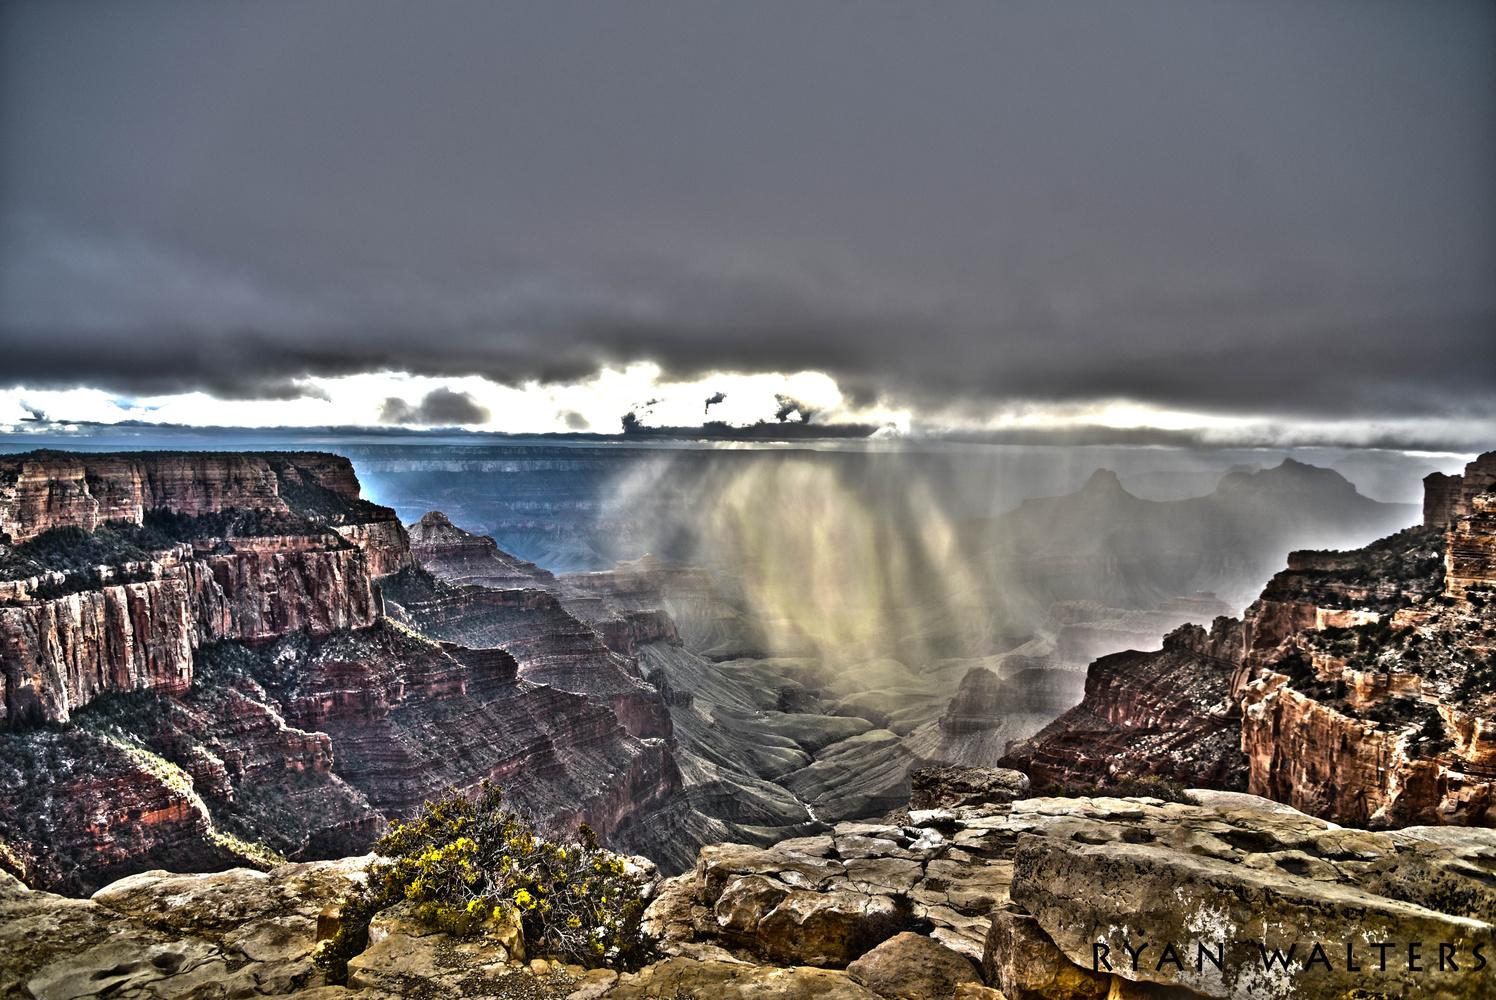 Battle Ship Horizon - Grand Canyon by Ryan Walters